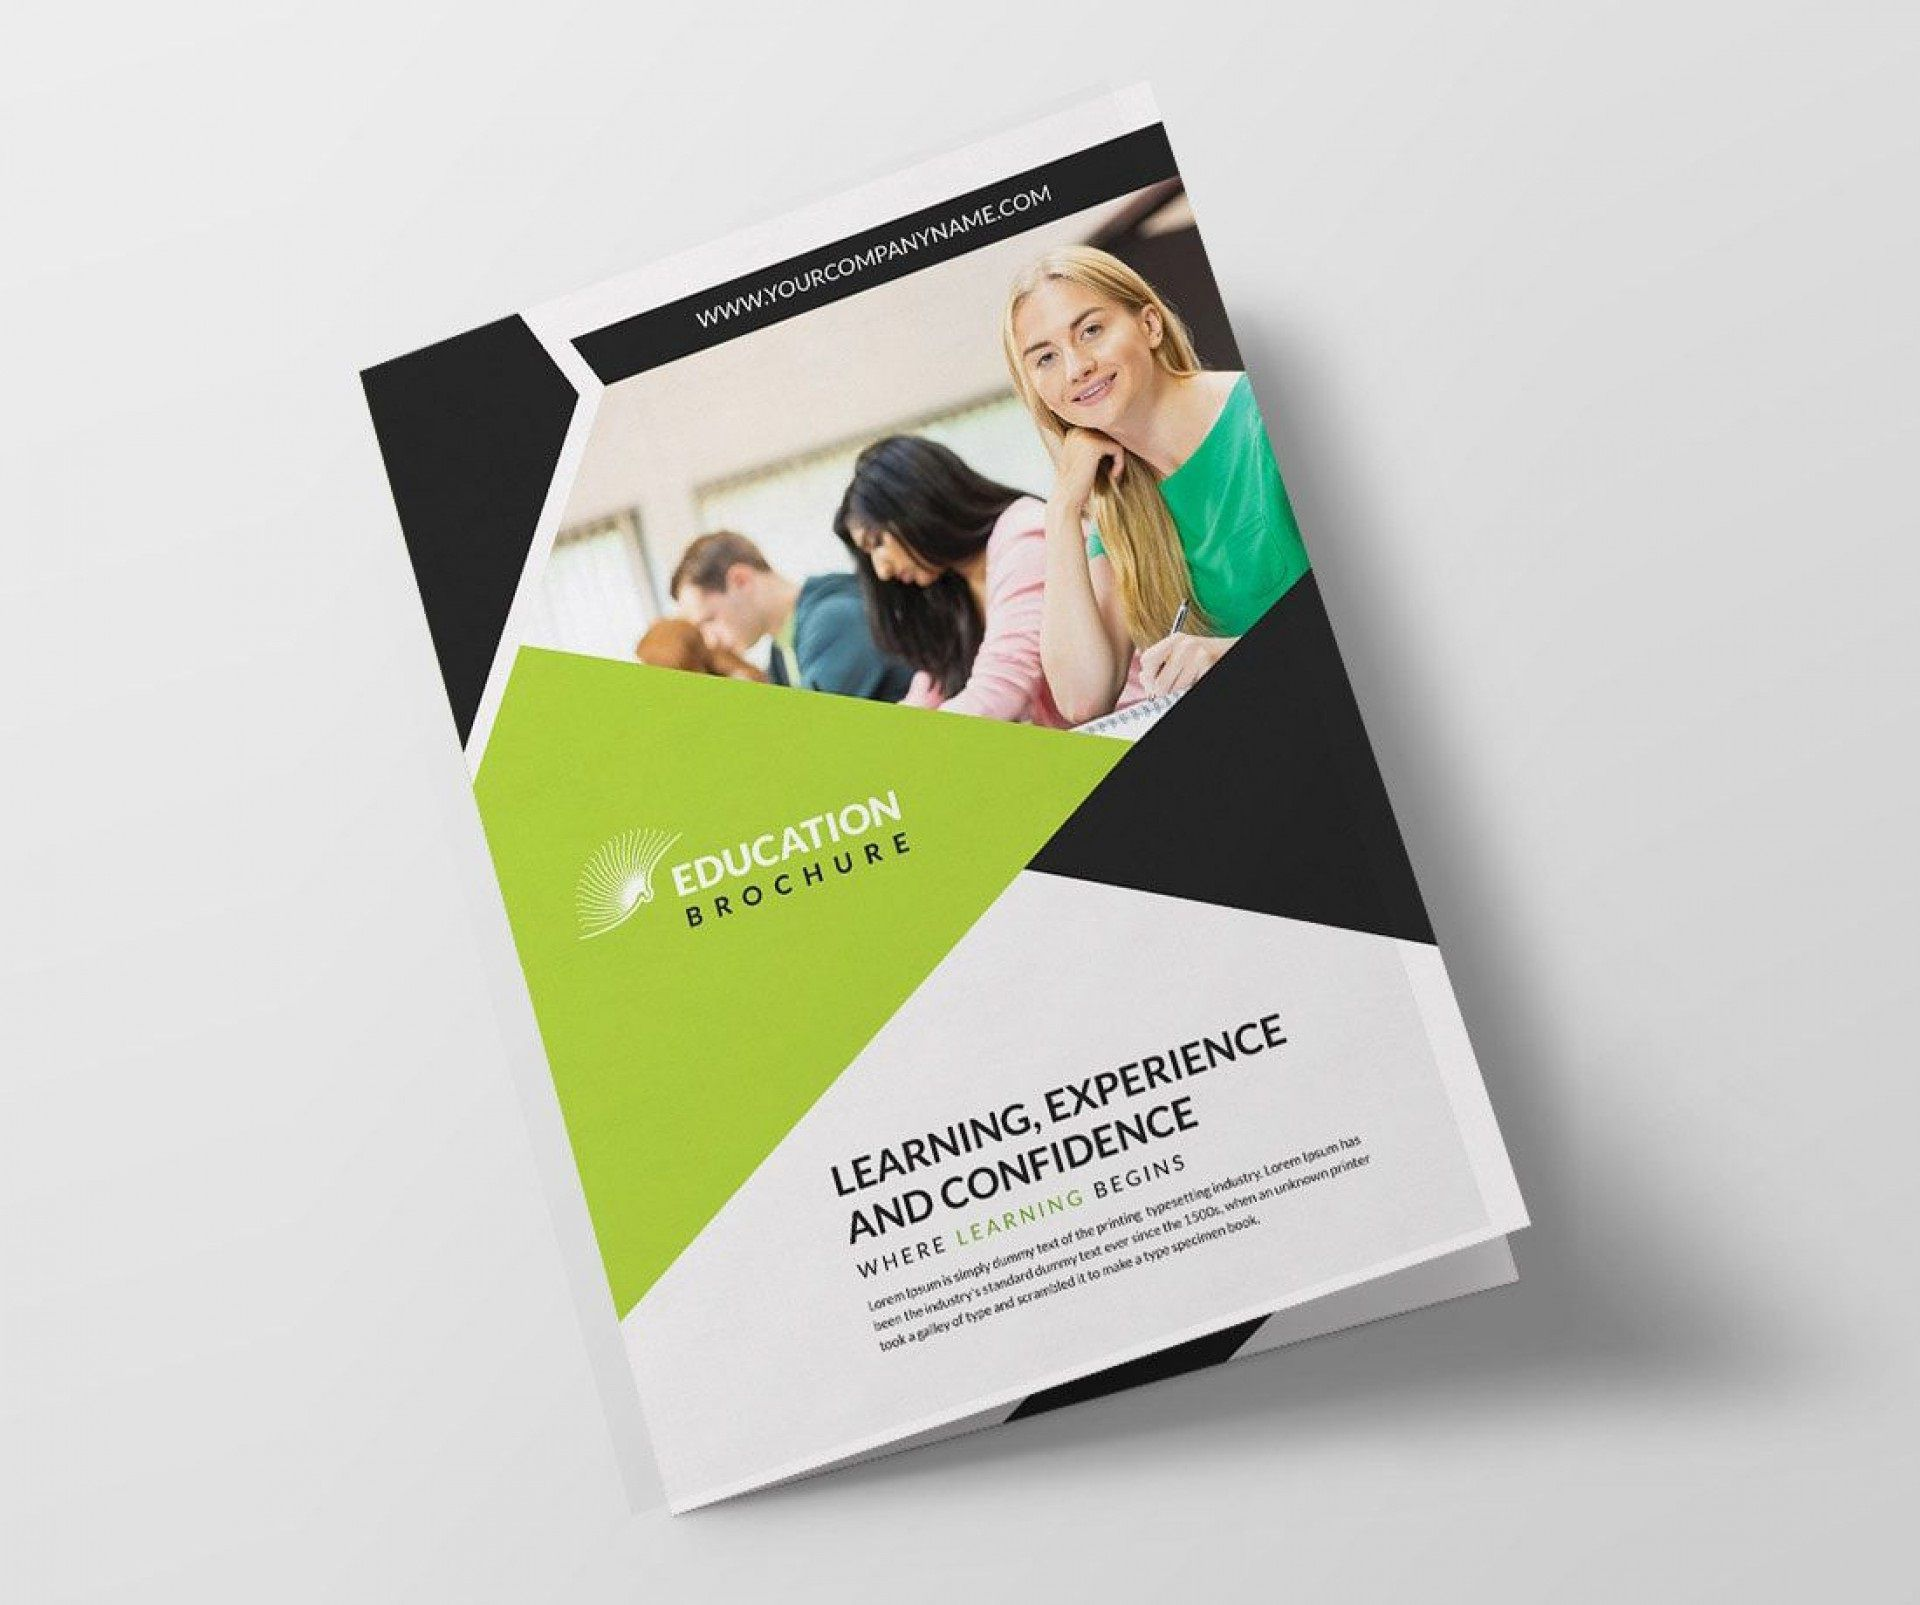 005 Stirring Brochure Template For Word 2010 Inspiration  Download Microsoft Free Blank Tri FoldFull